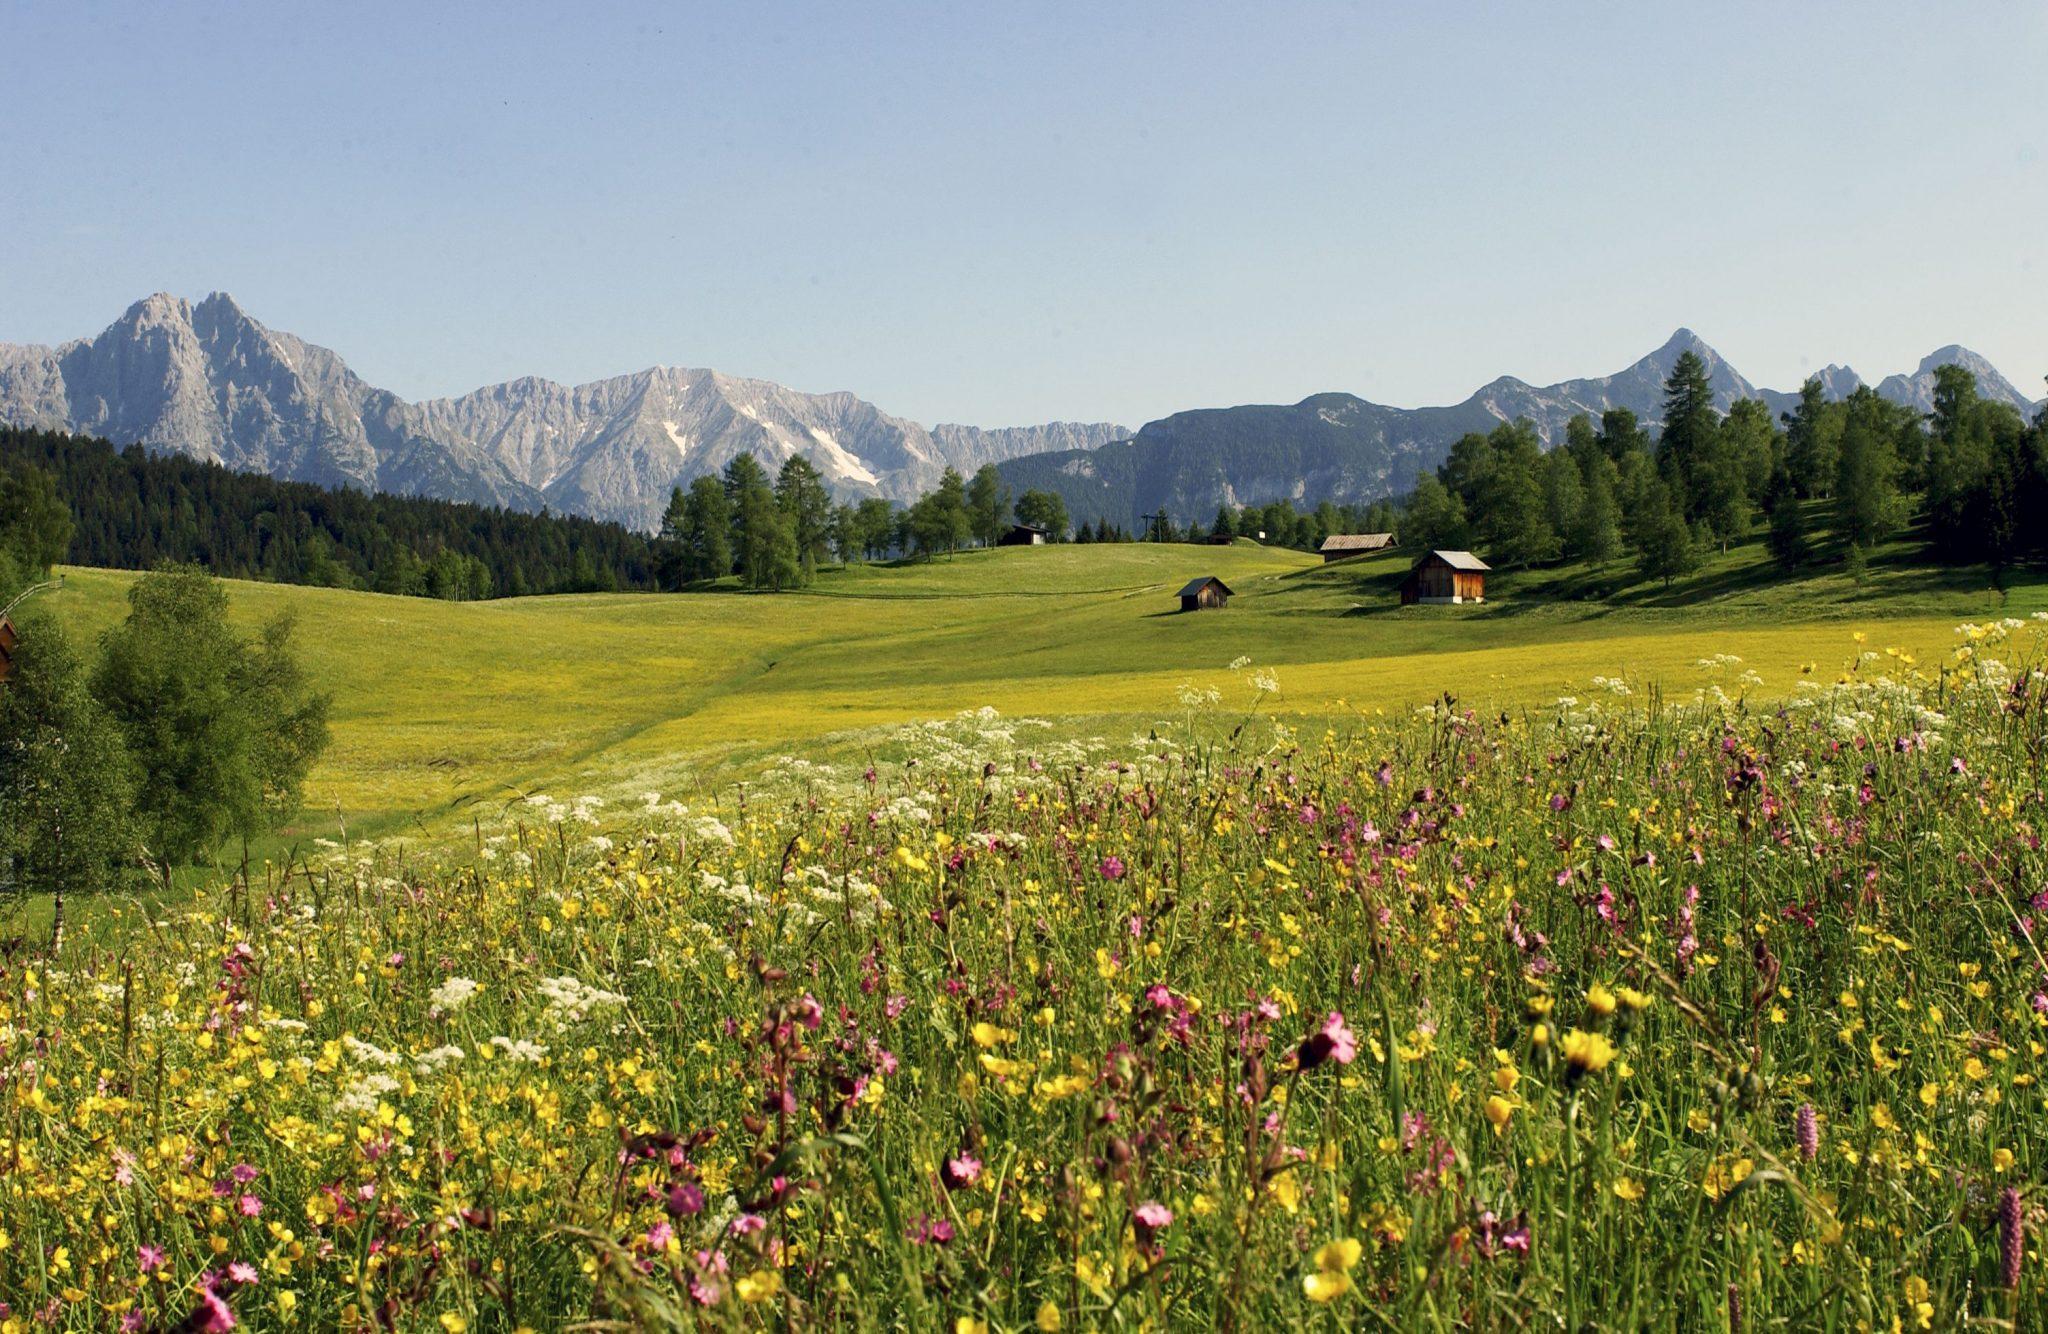 Geigenbühel bei Seefeld mit Blick auf das Wettersteingebirge, Foto: Olympiaregion Seefeld | Climbers Paradise